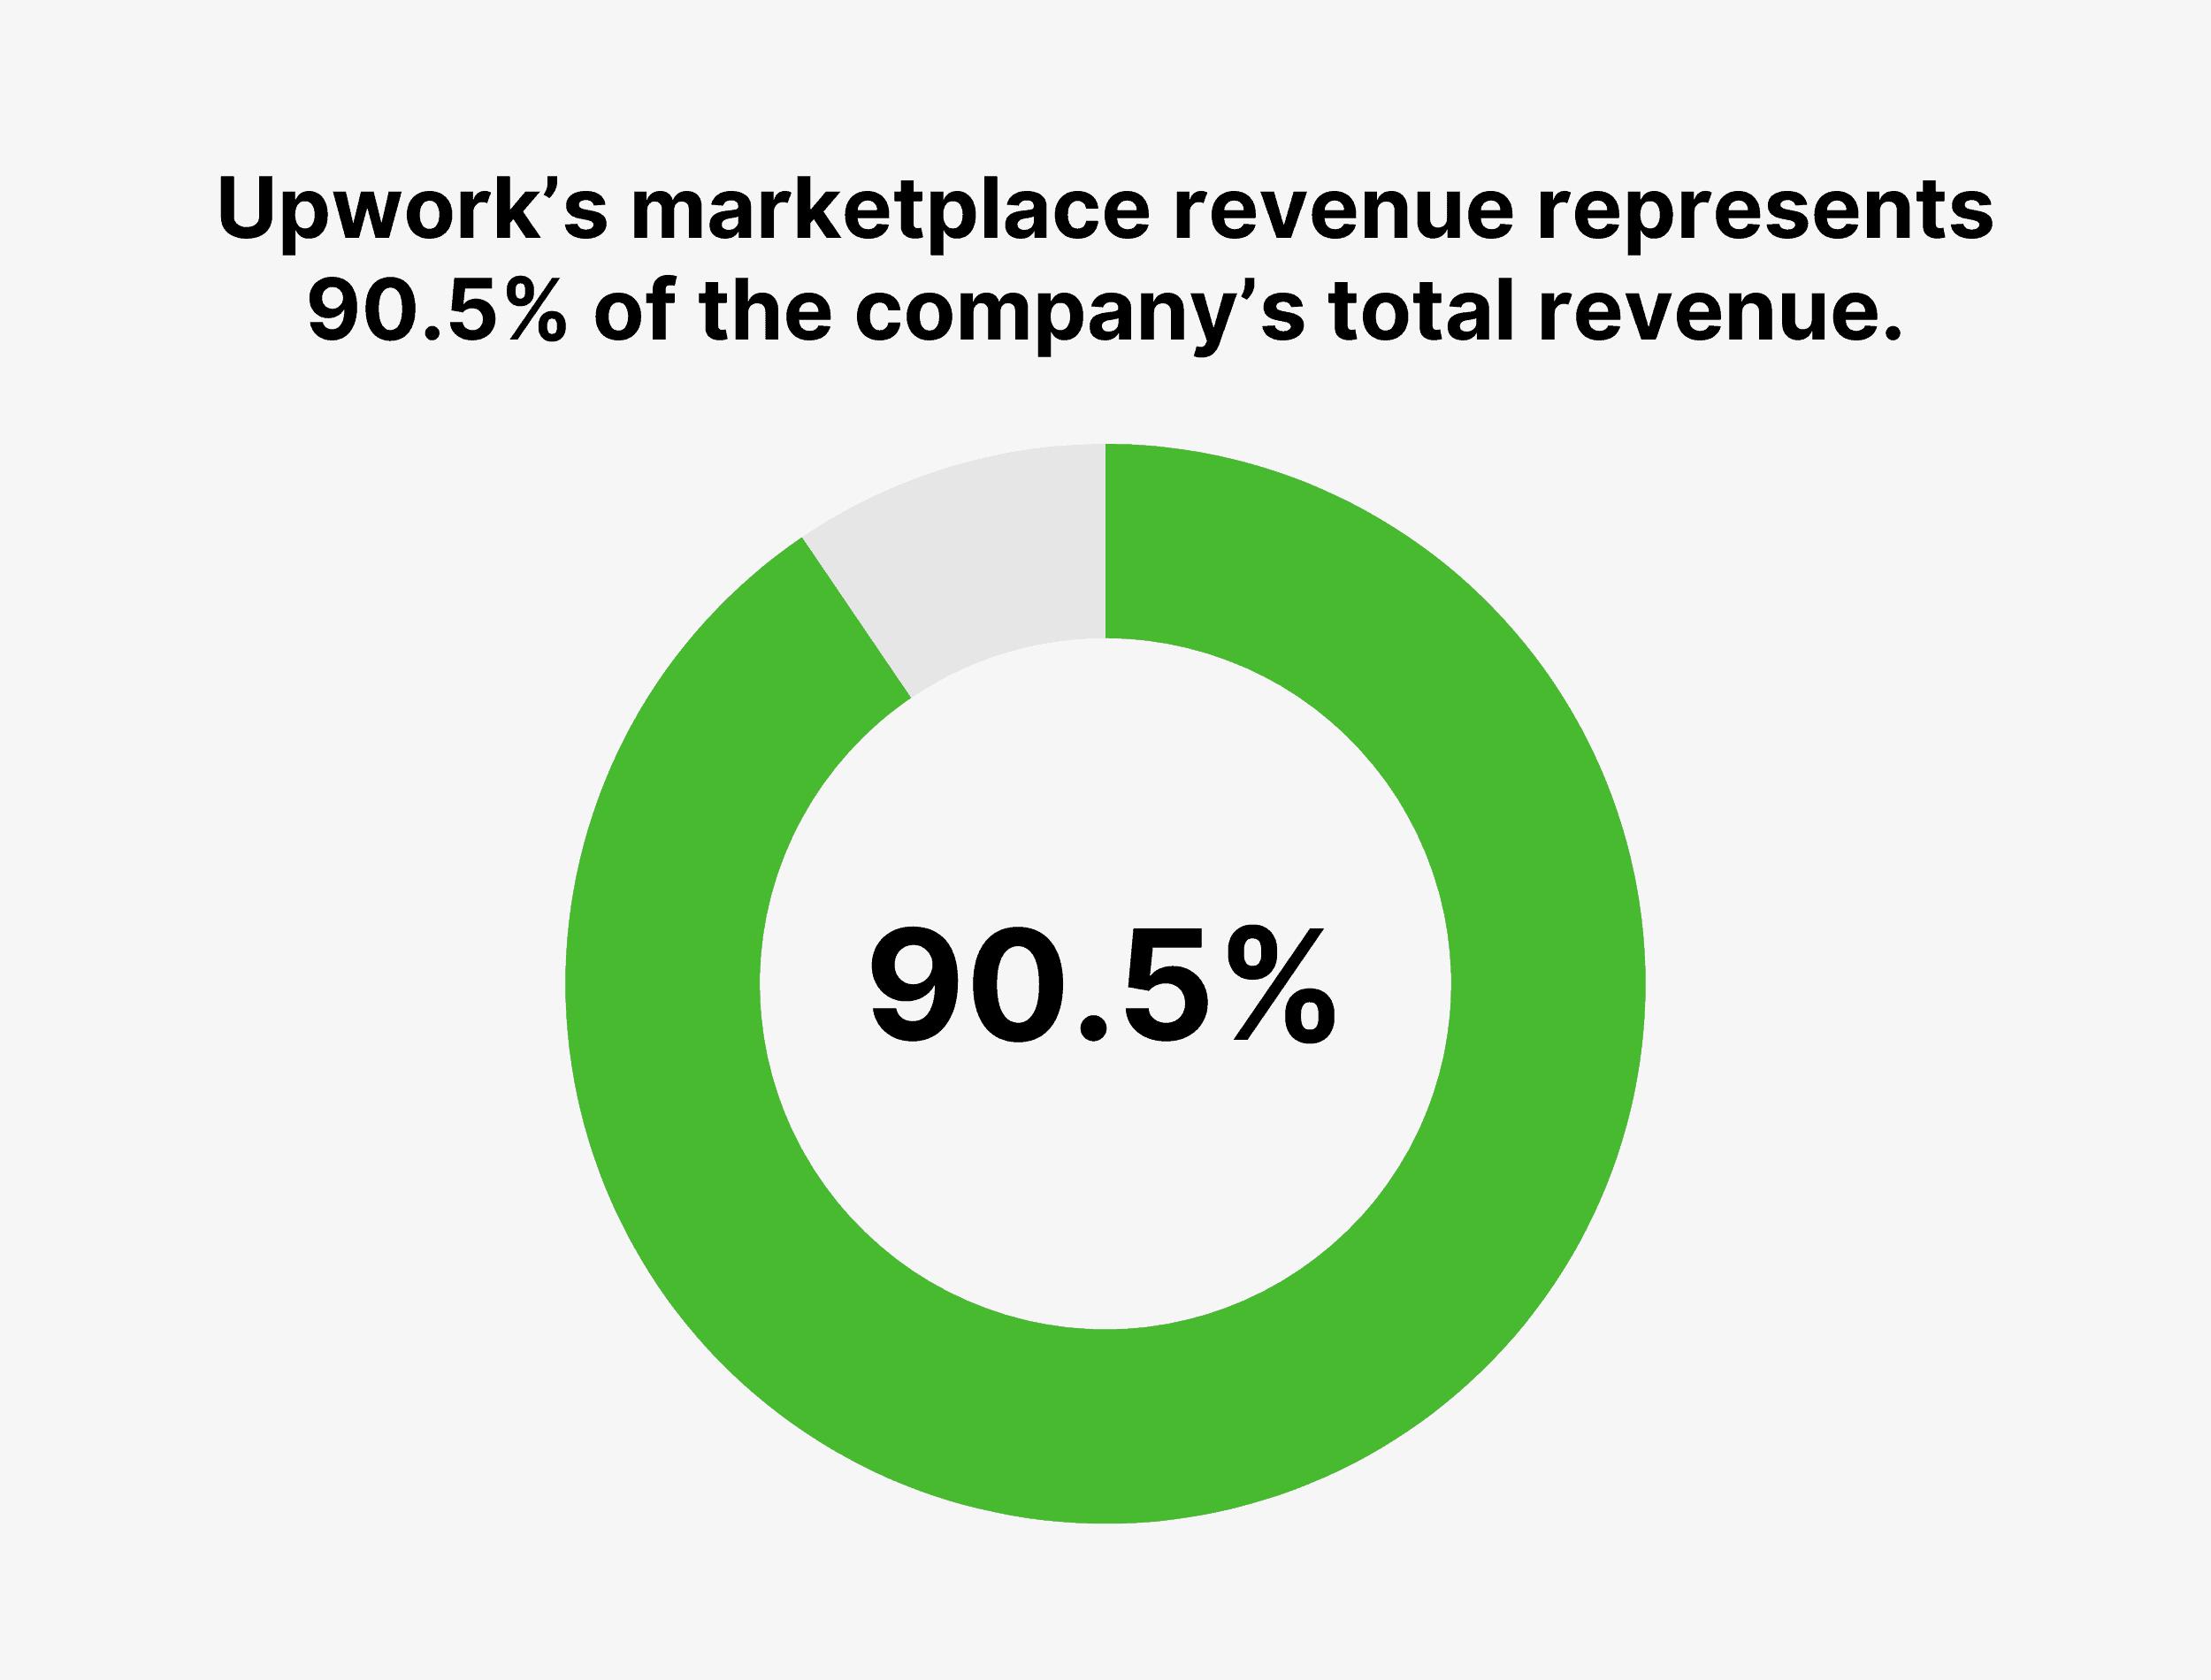 Upwork's marketplace revenue represents 90.5% of the company's total revenue.